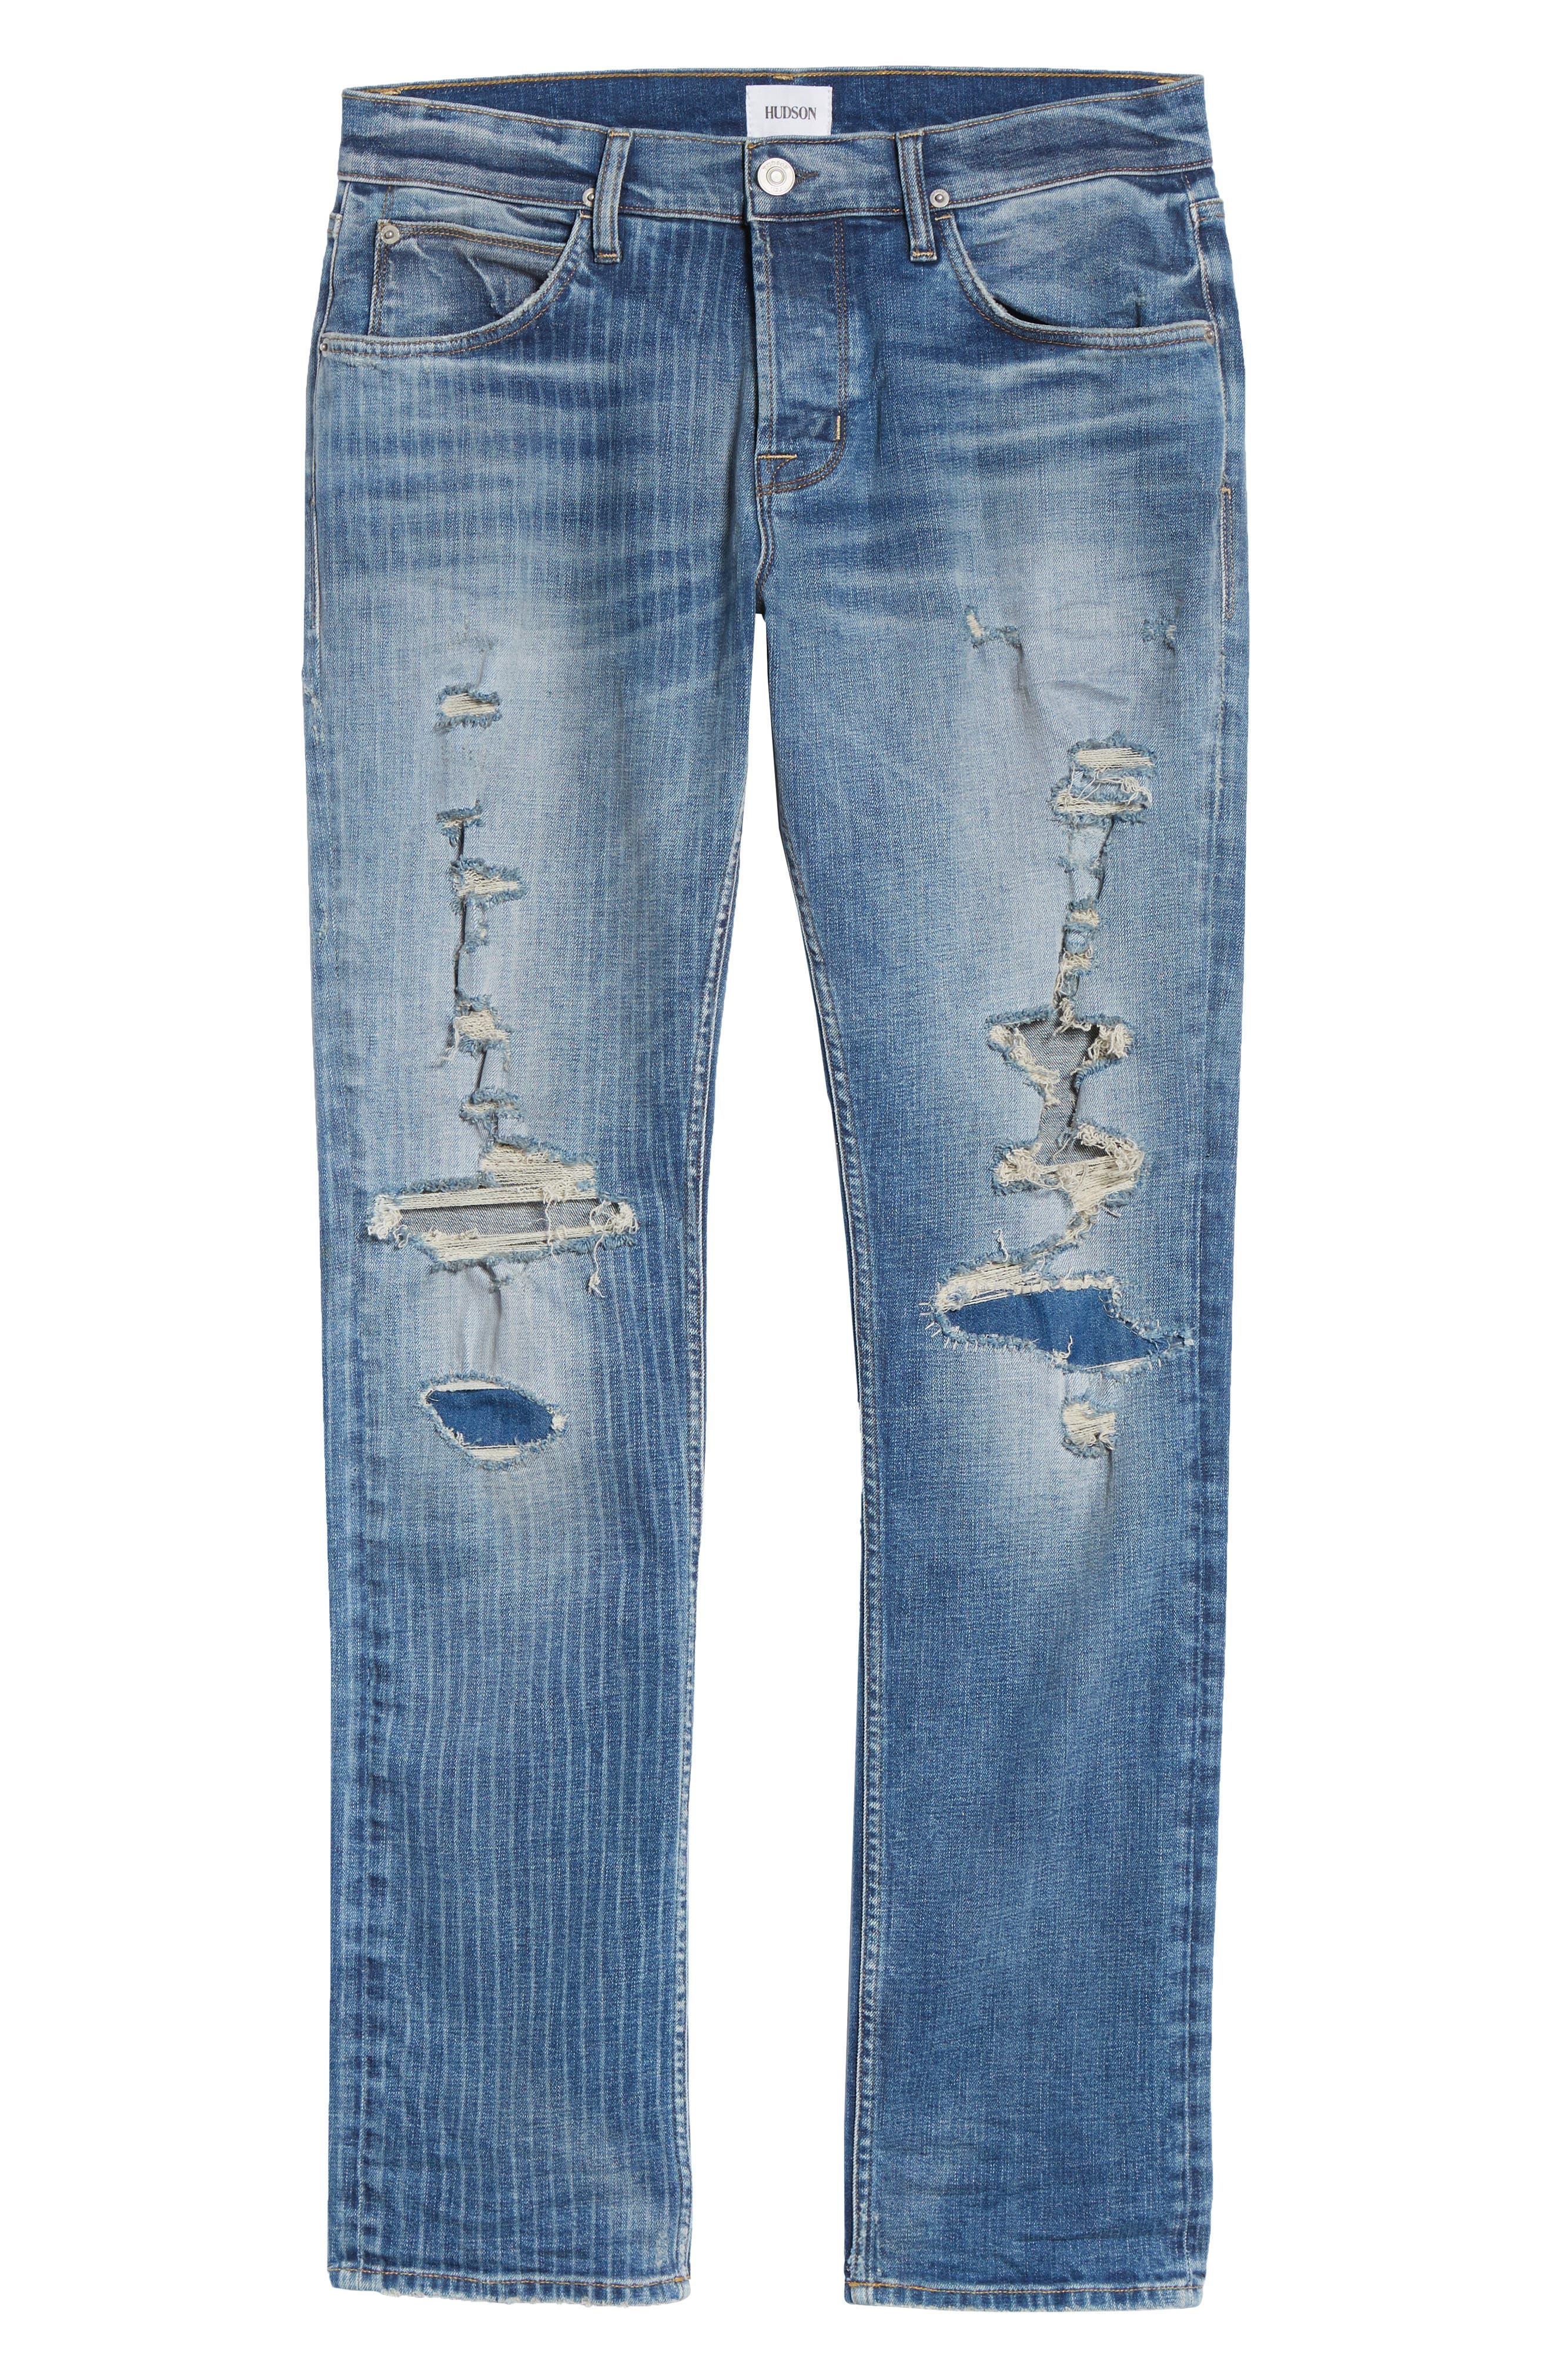 Blake Slim Fit Jeans,                             Alternate thumbnail 6, color,                             Eagle Rock